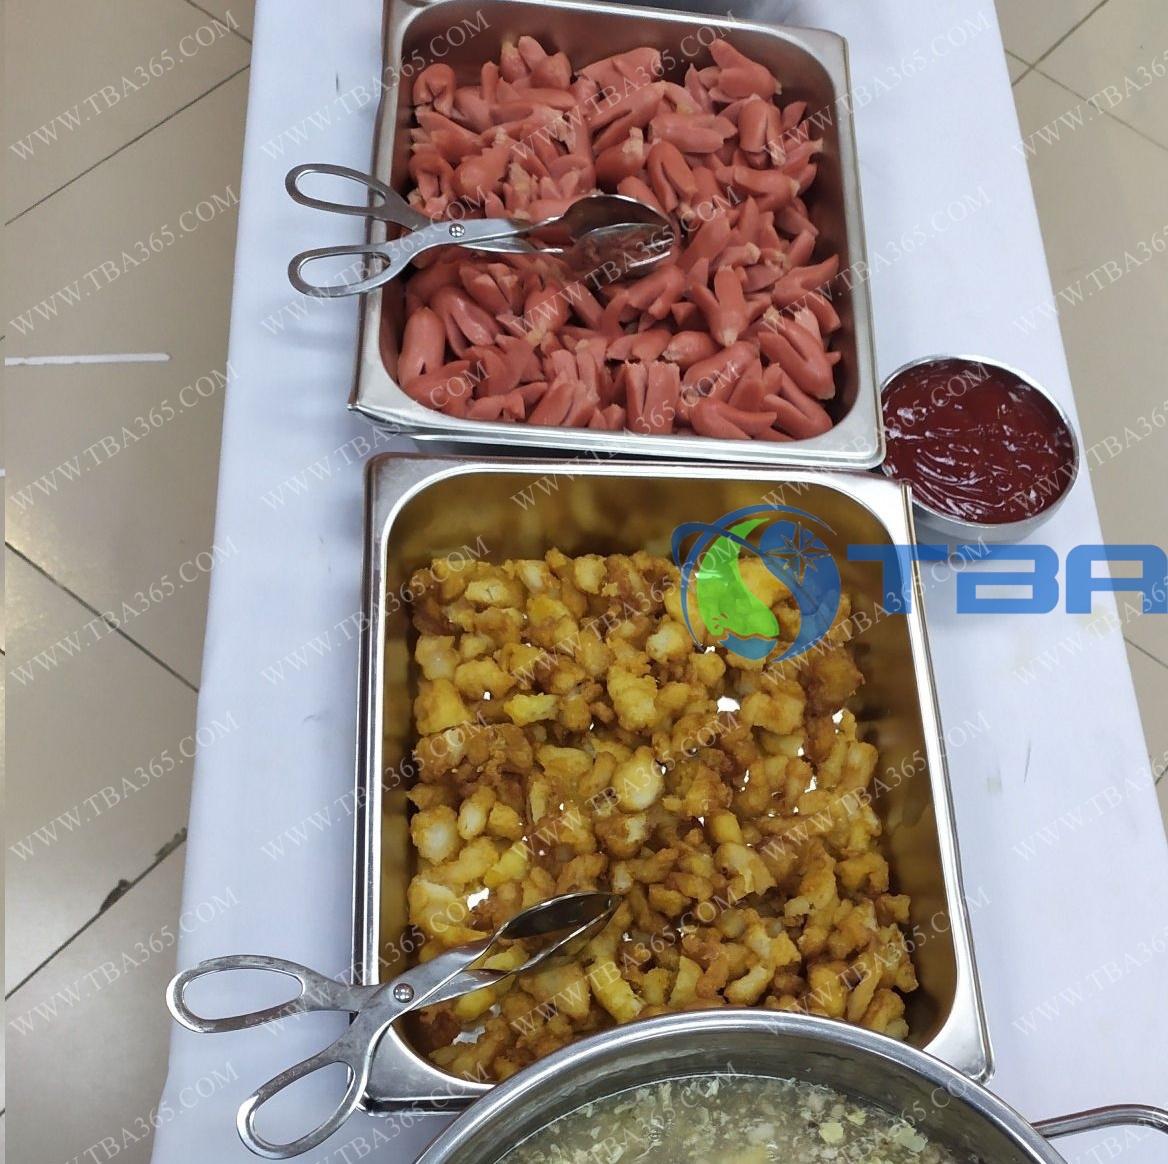 Kẹp dạng kéo cho buffet cao cấp